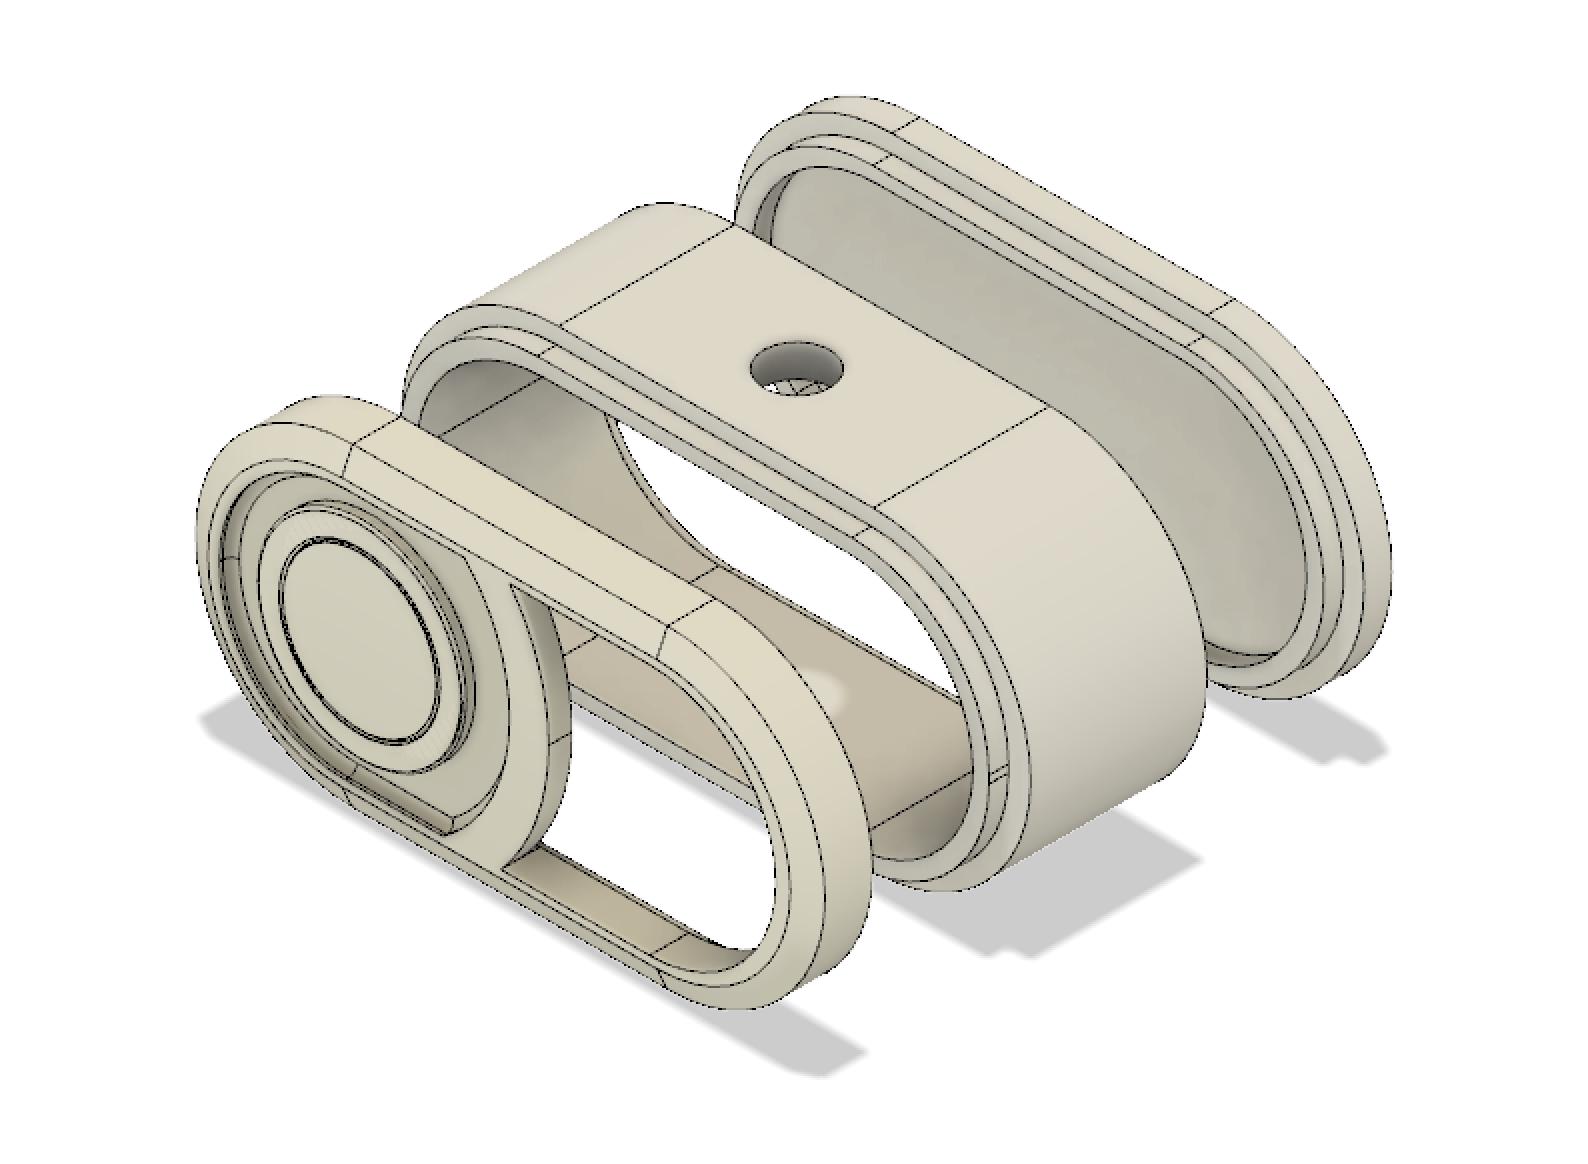 CAD model in Fusion 360